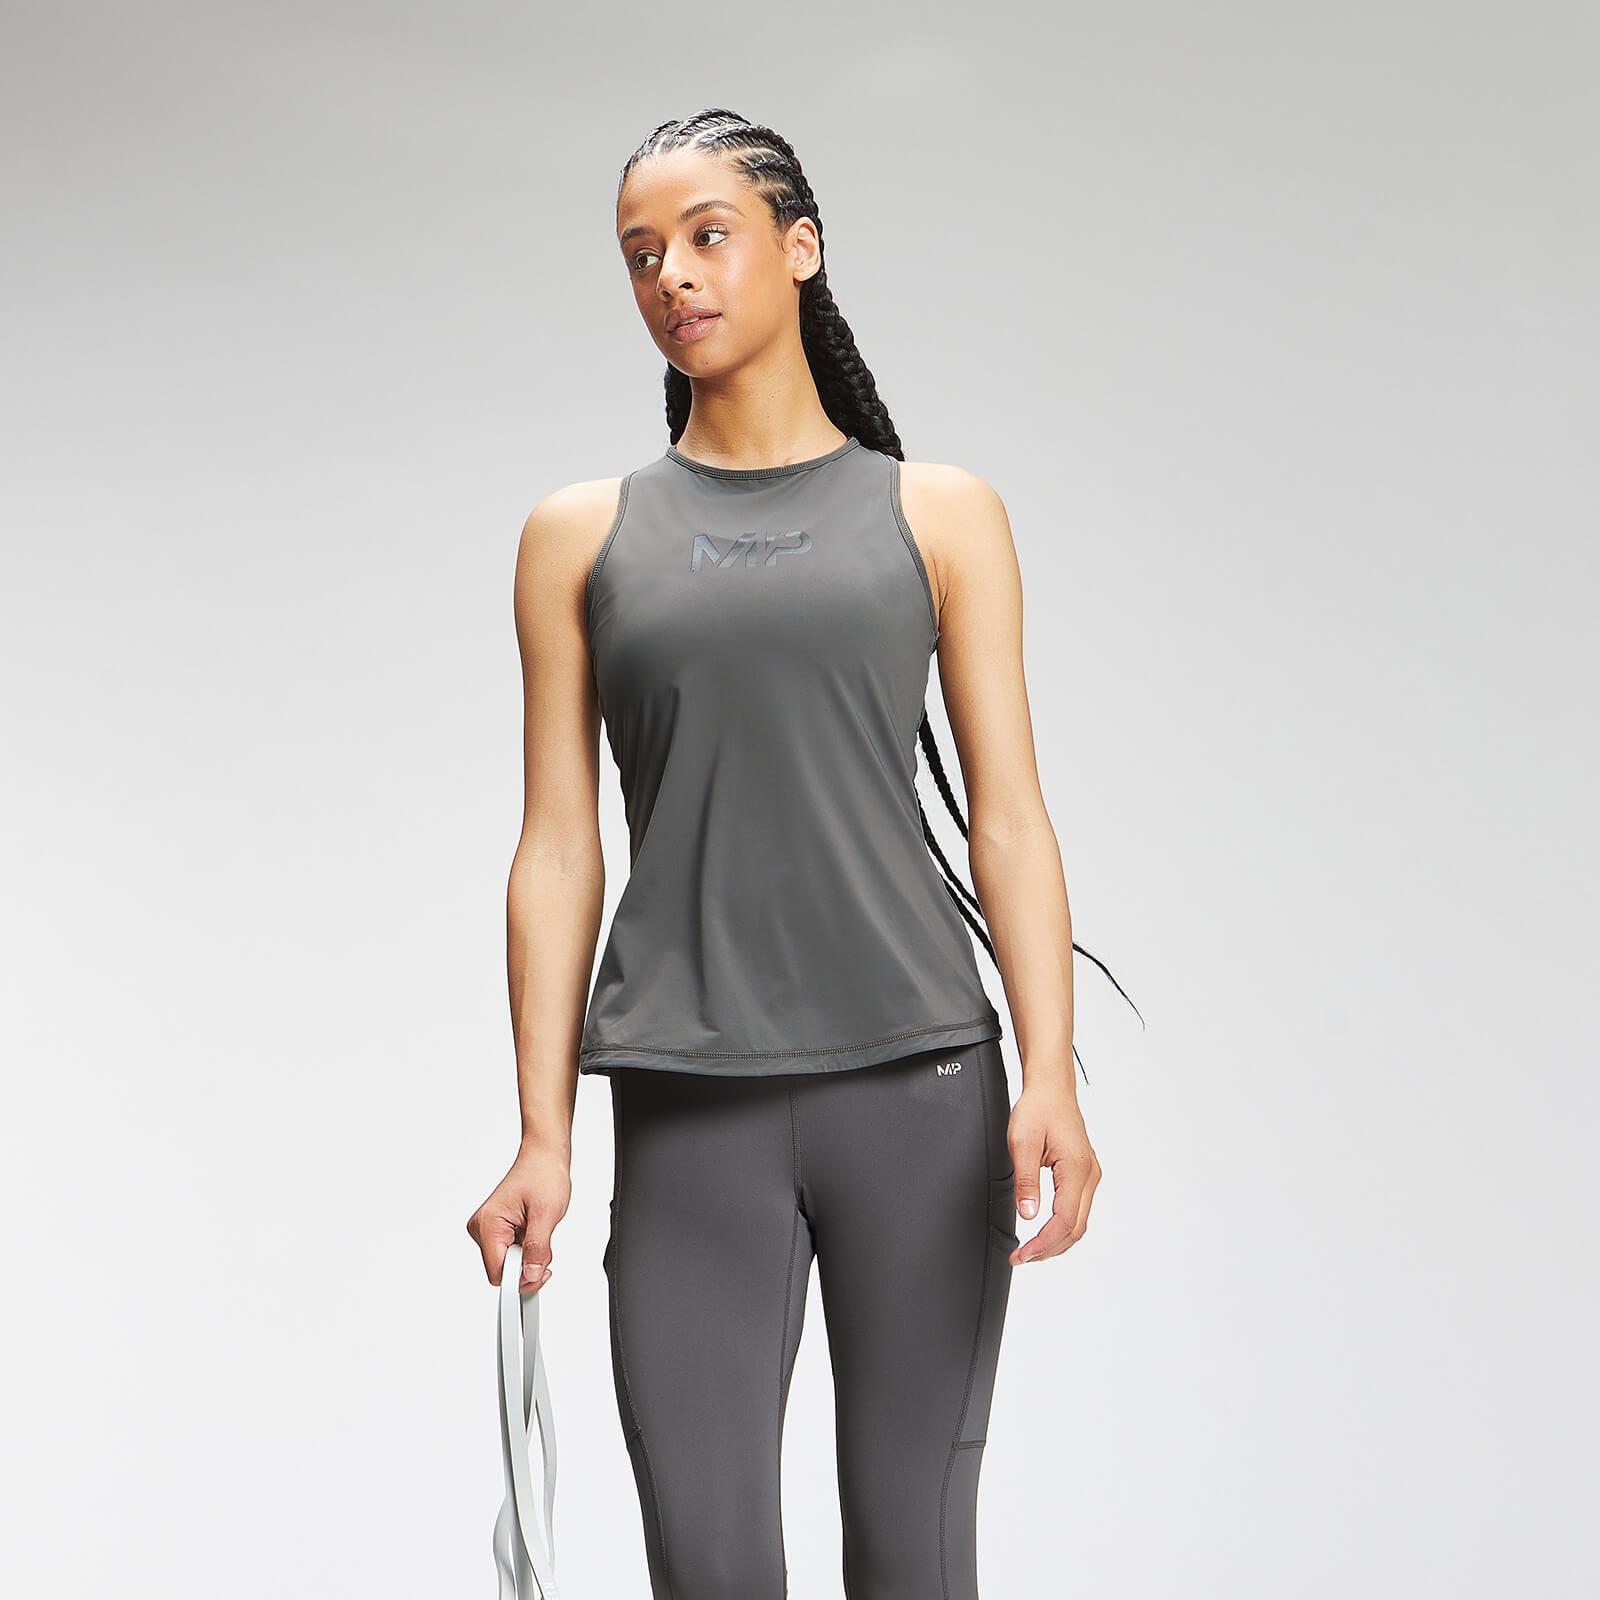 Купить MP Women's Tempo Vest - Carbon - XS, Myprotein International